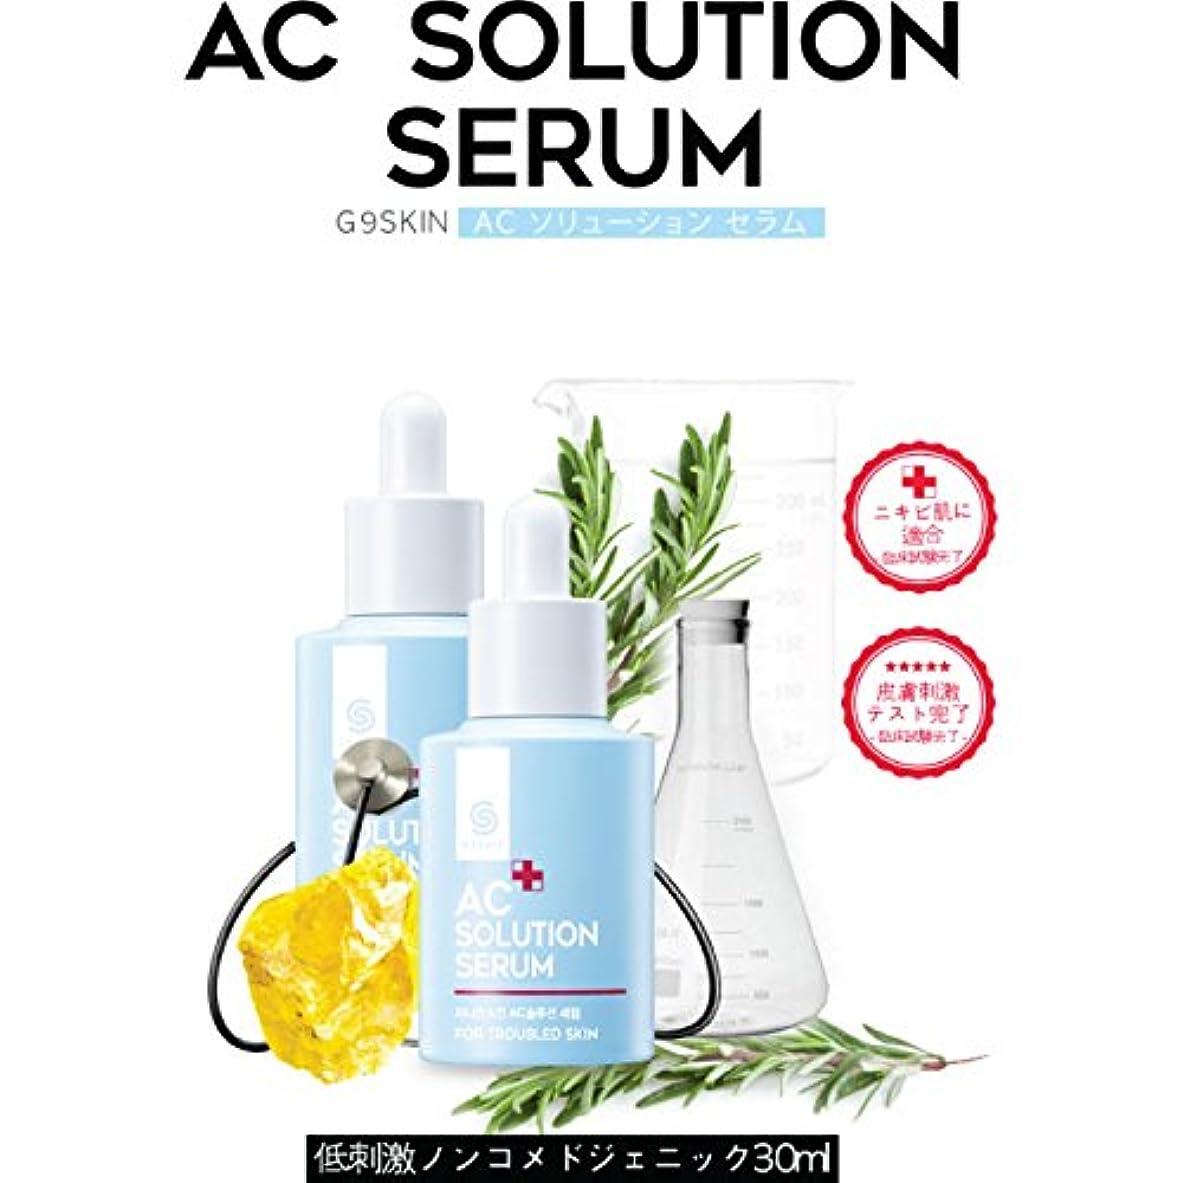 【G9SKIN】AC SOLUTION SERUM / ACソリューションセラム(美容液)